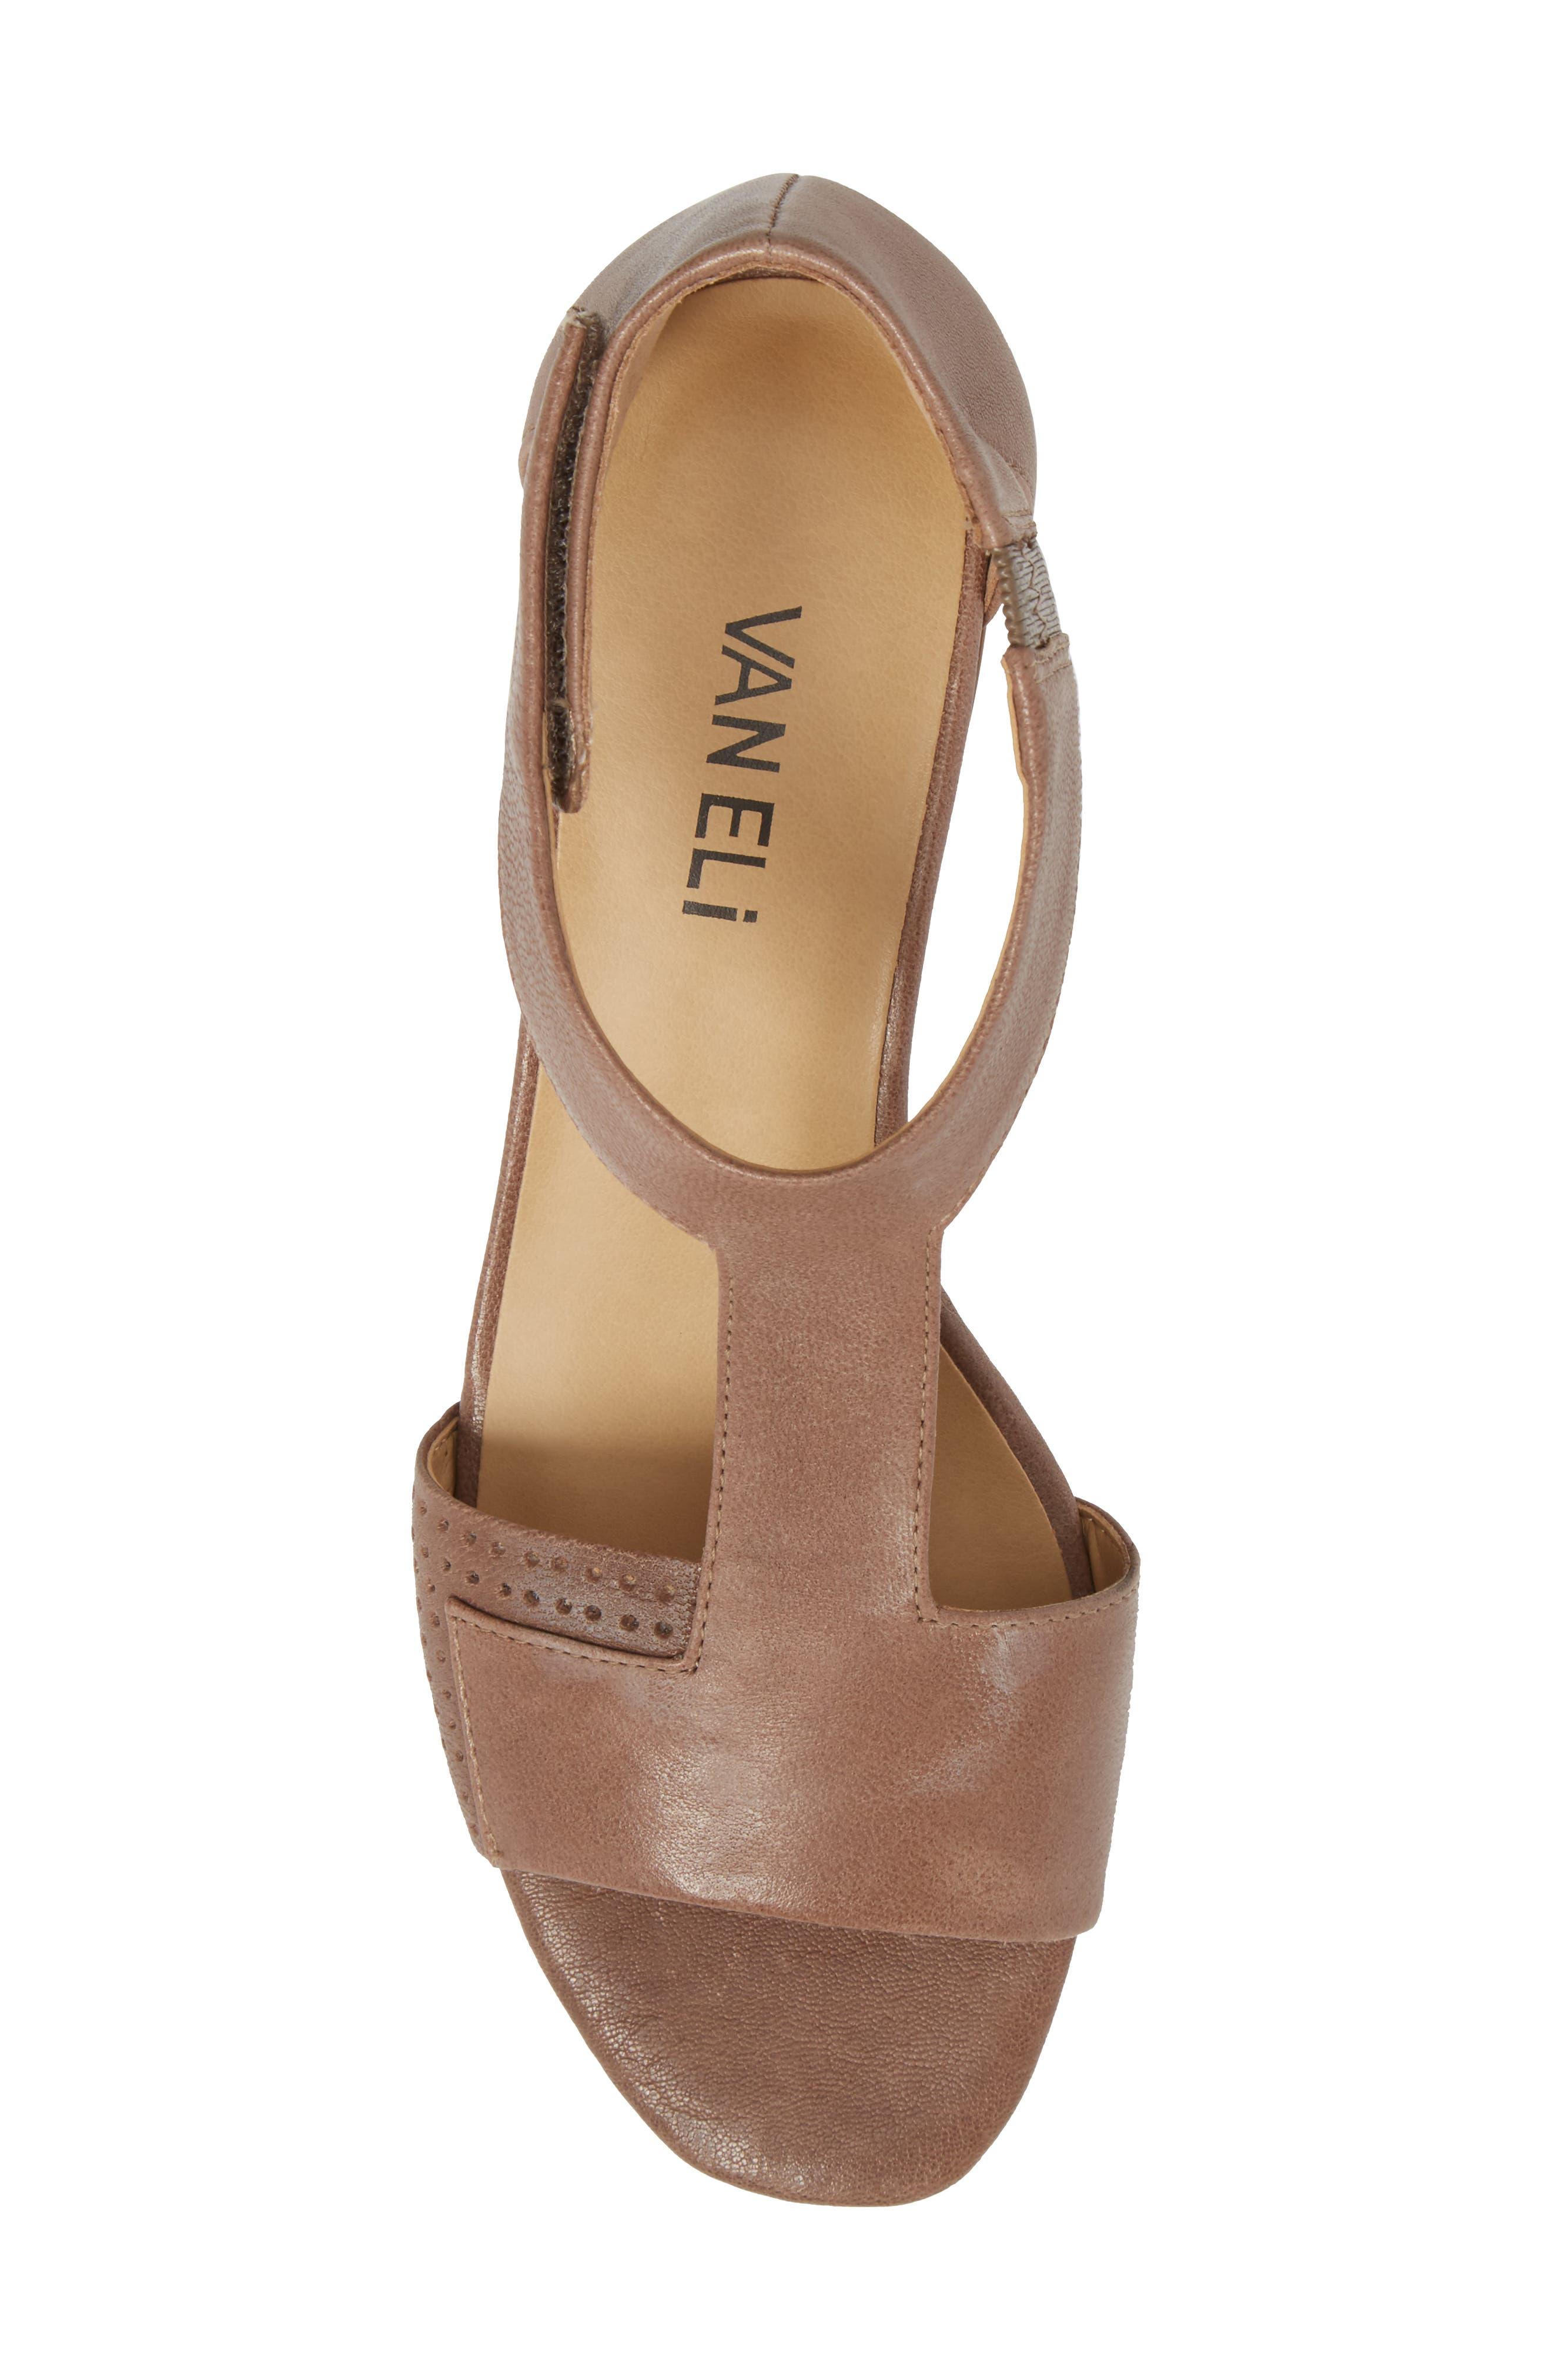 VANELI, Calyx Block Heel Sandal, Alternate thumbnail 5, color, STONE LEATHER